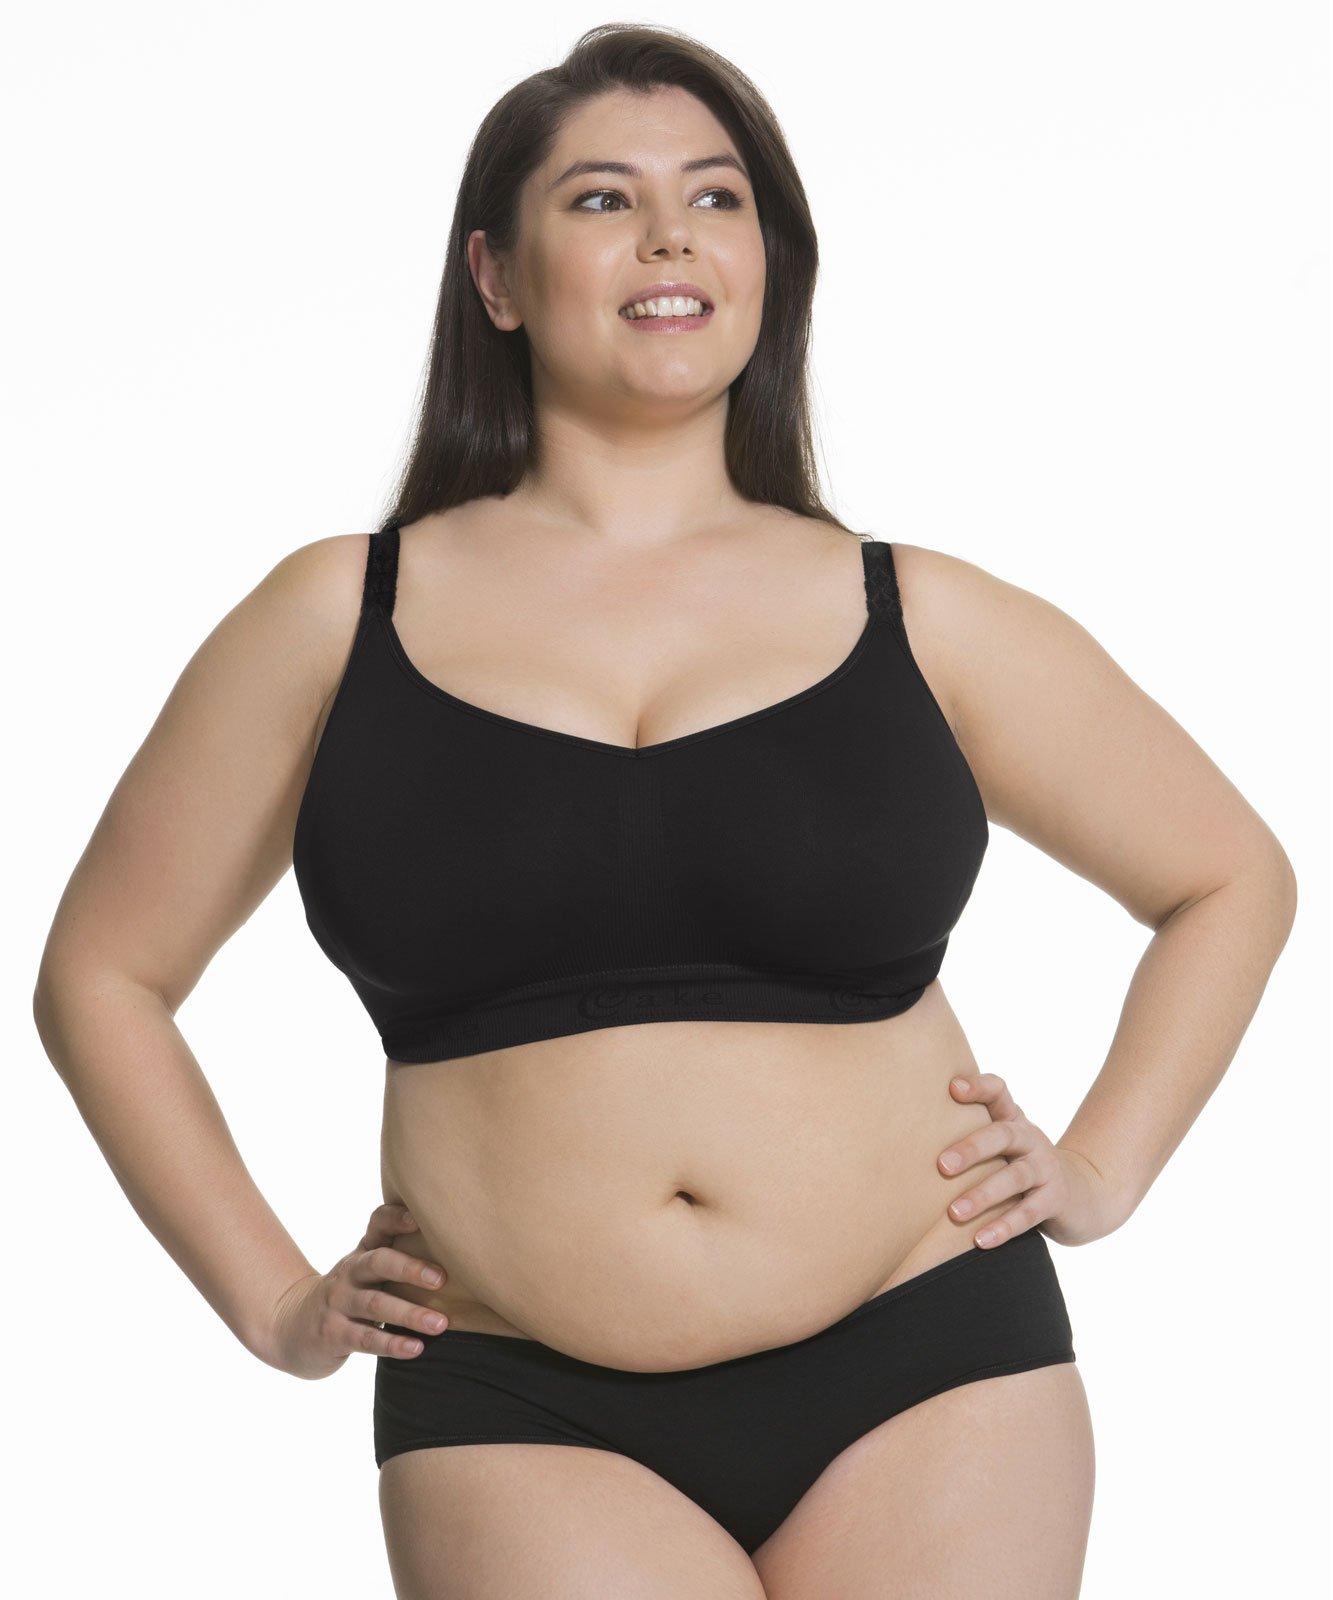 9a95403275 Sugar Candy Non-wired bra (Black) by Cake - Non-Underwired bras ...